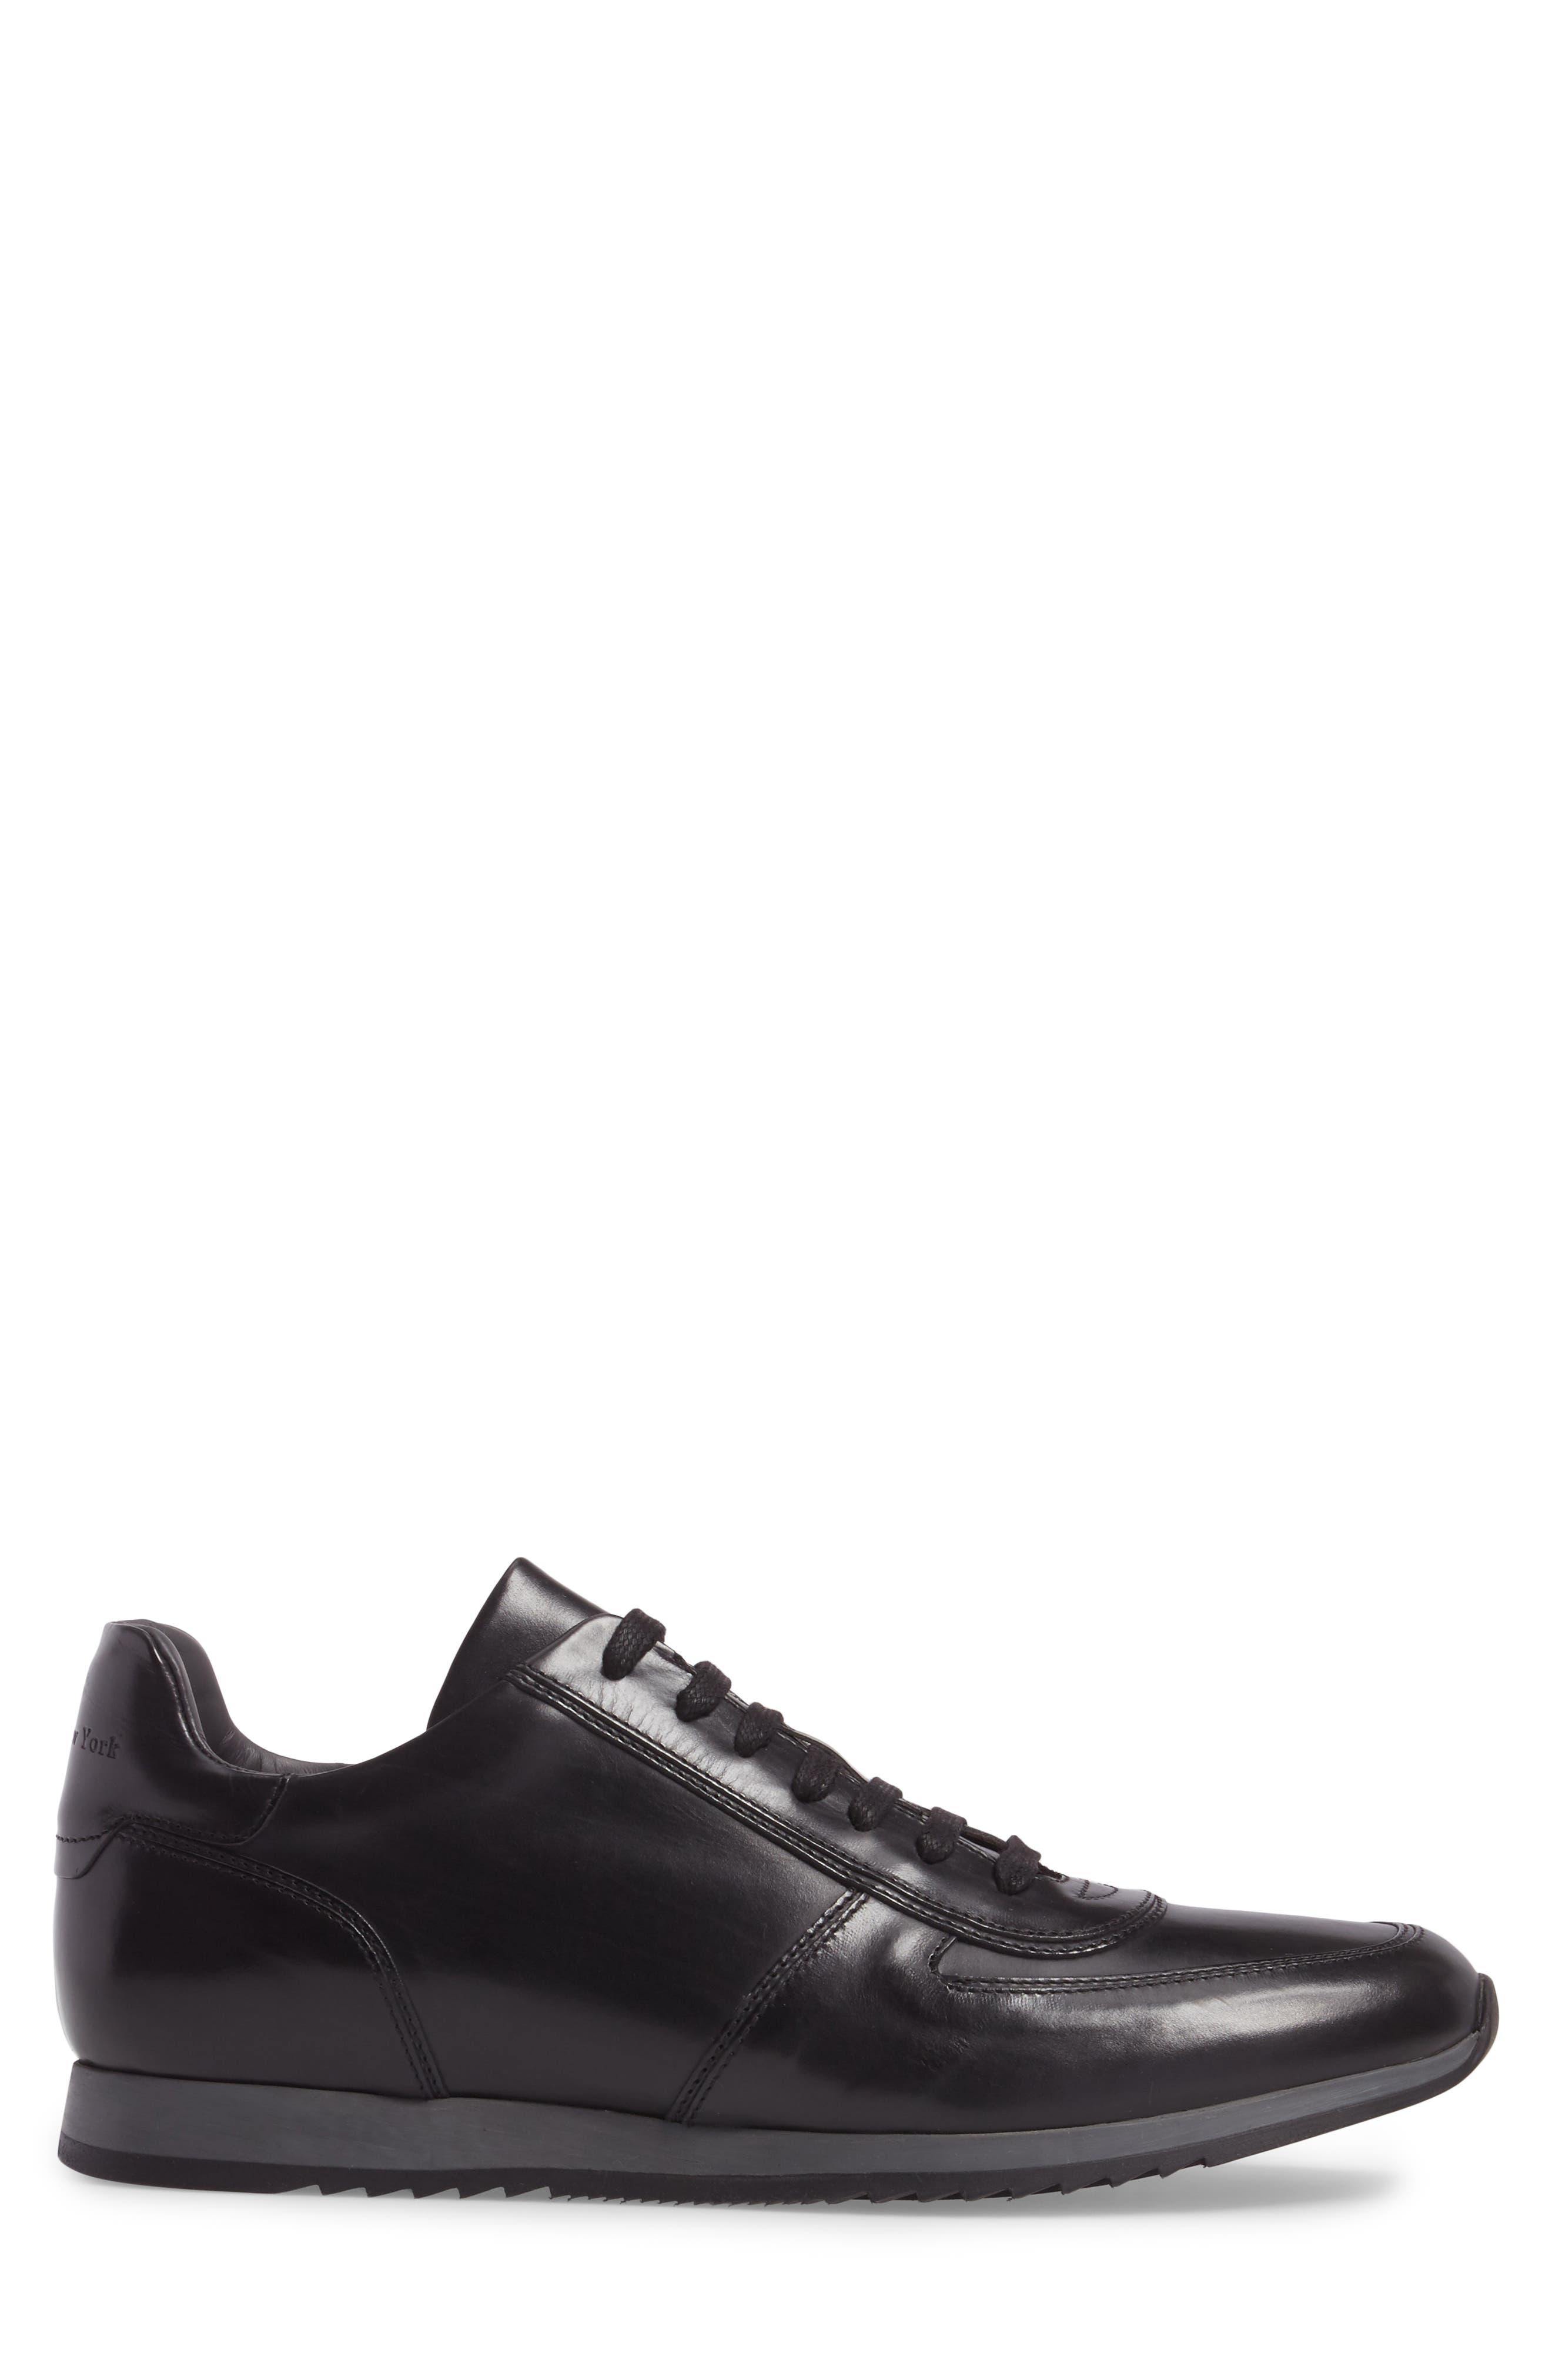 Hatton Sneaker,                             Alternate thumbnail 3, color,                             003